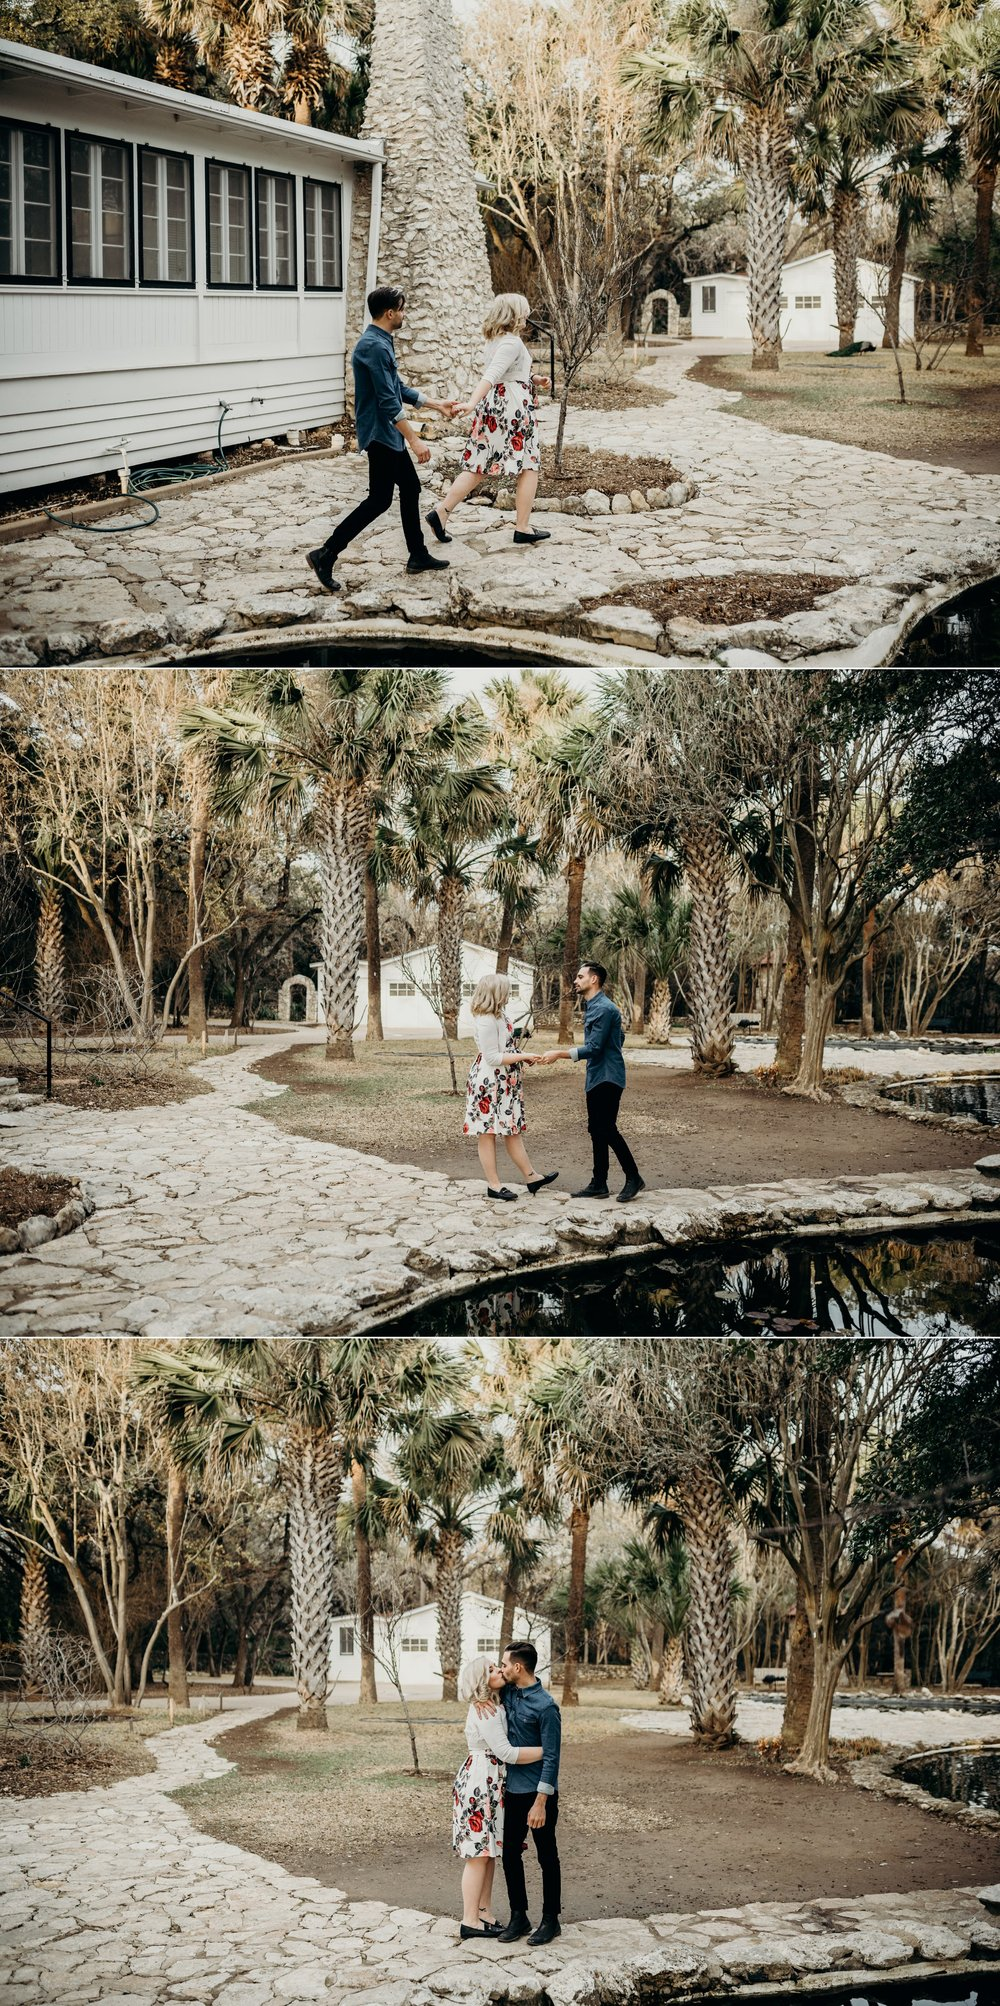 drew-andrew-texas-austin-minnesota-minneapolis-wedding-photographer-destination-elopement-intimate-adventurous_0096.jpg